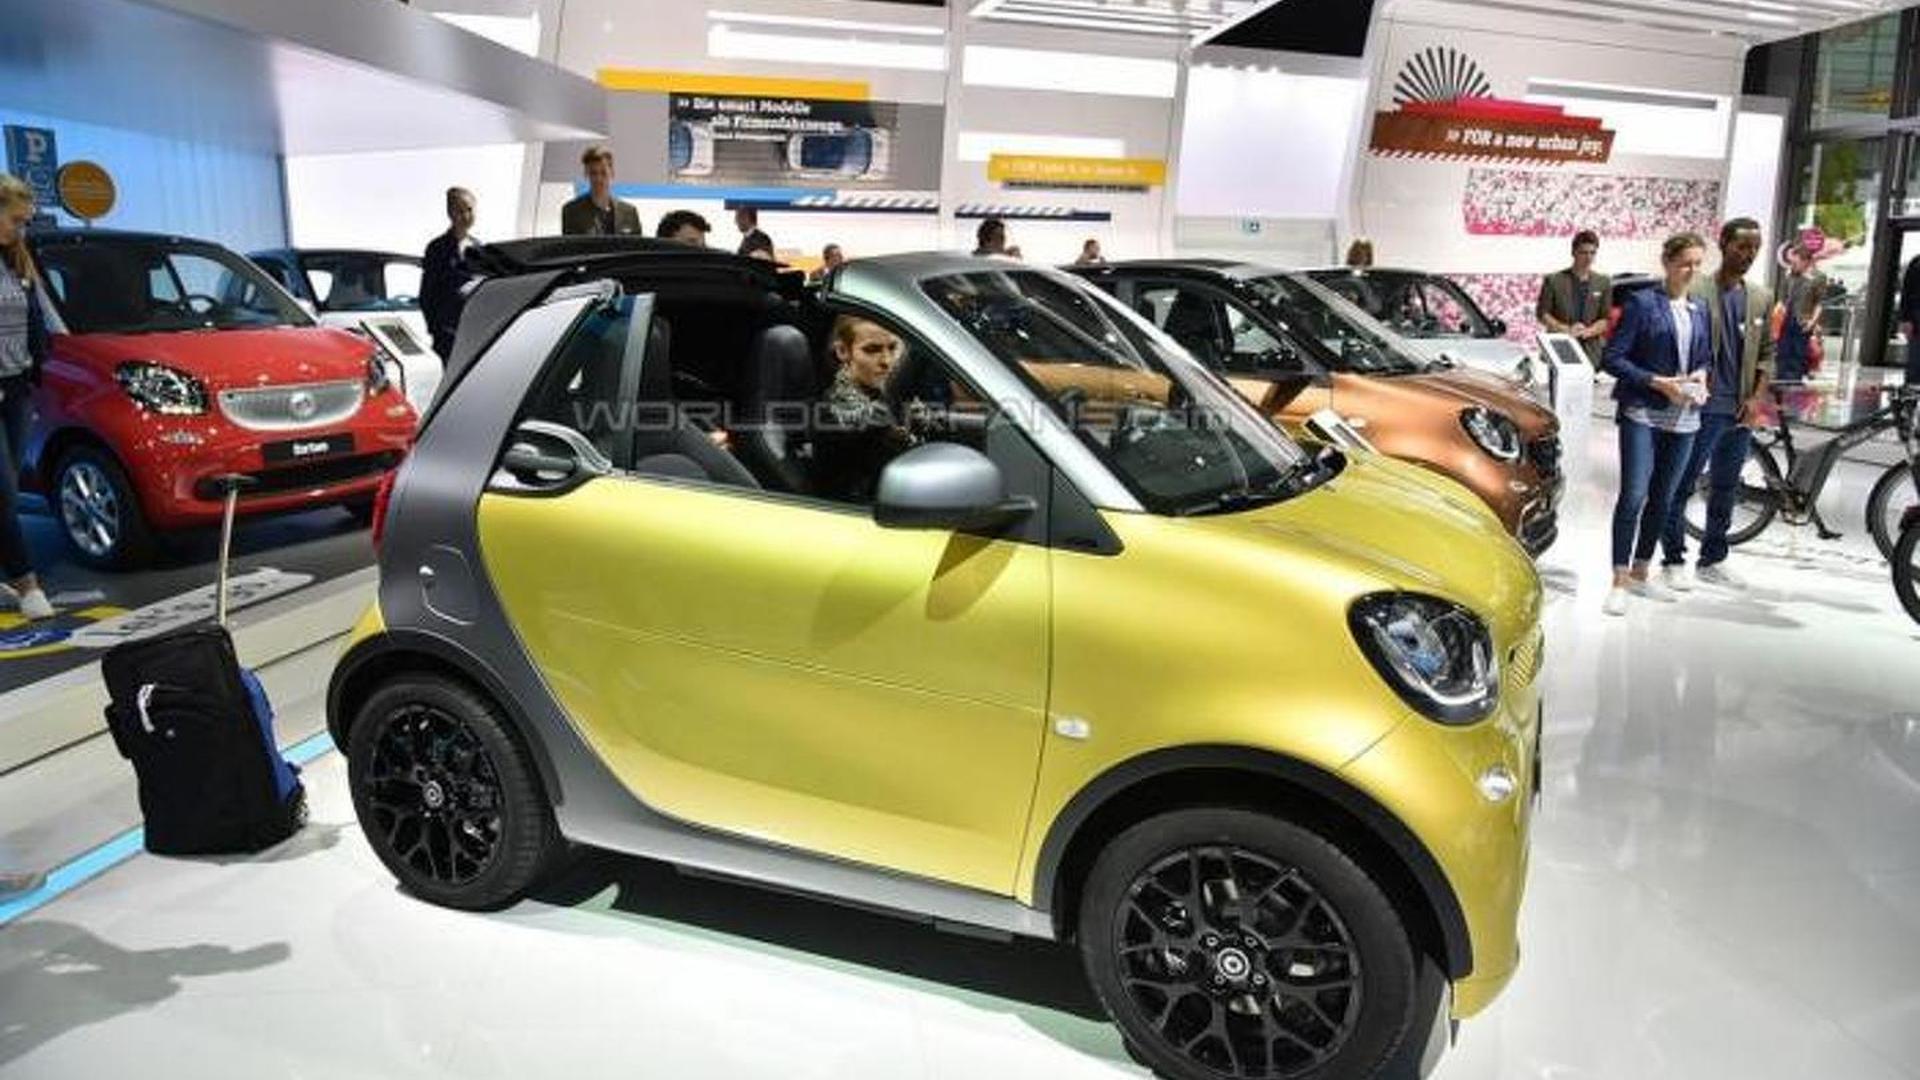 Smart ForTwo Cabrio arrives in Frankfurt